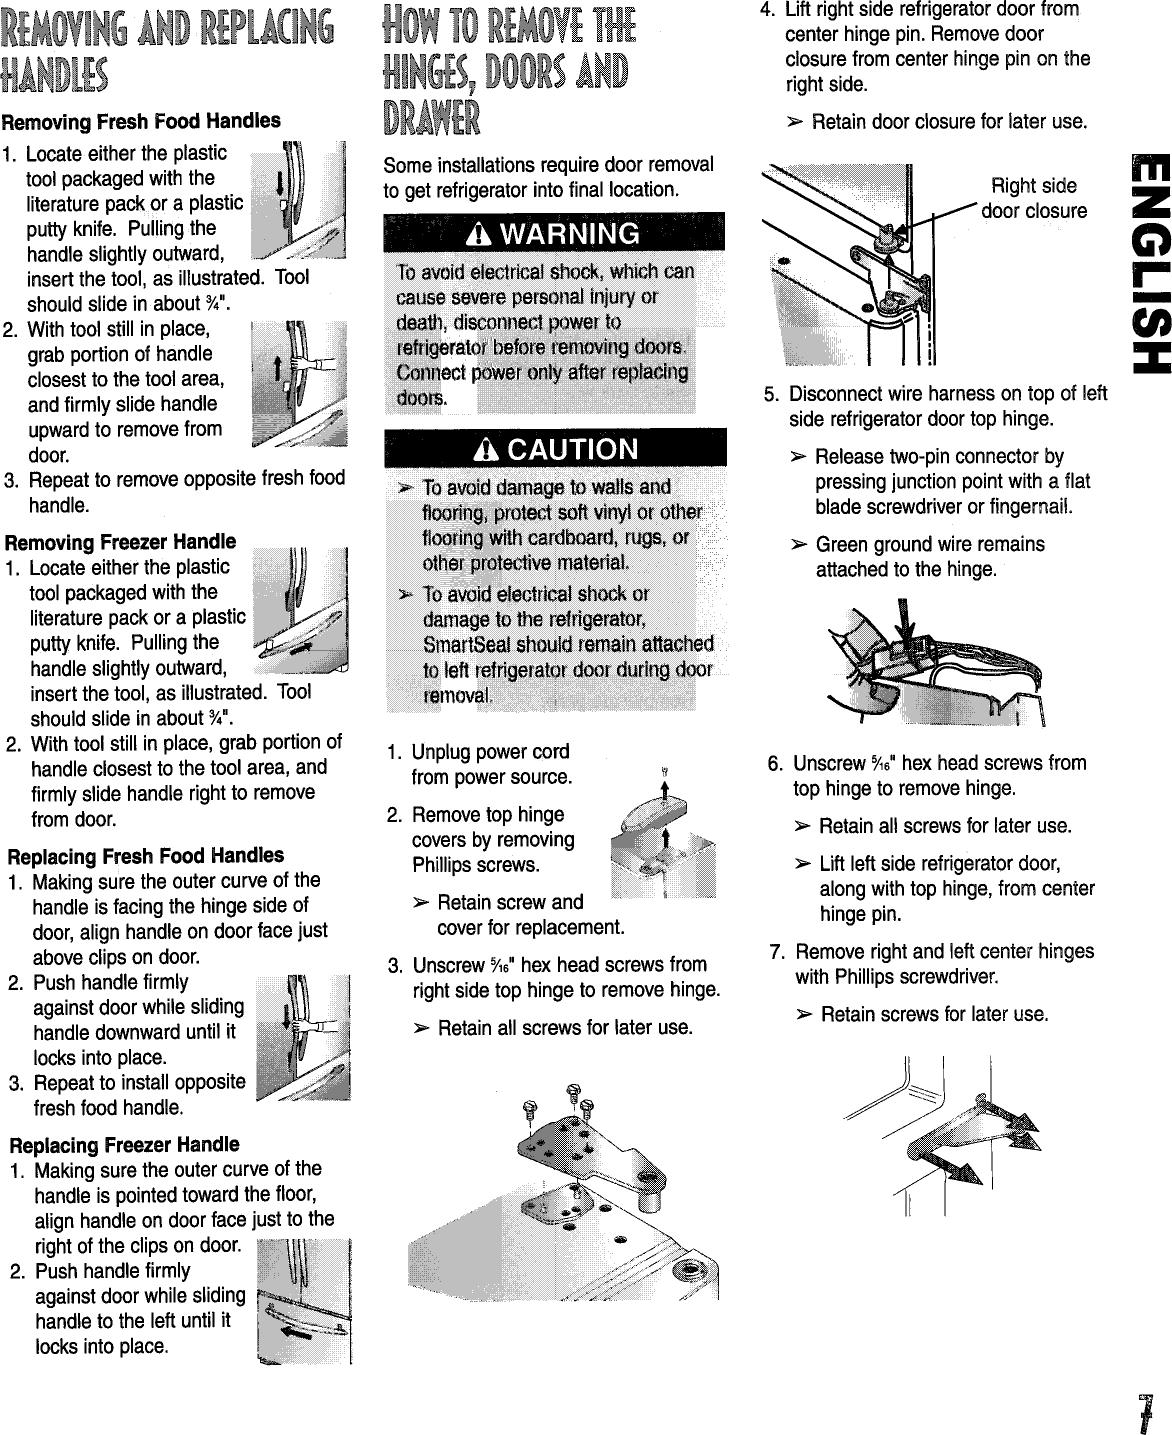 Phillips 7 Way Trailer Plug Wiring Diagram - Wiring Solutions